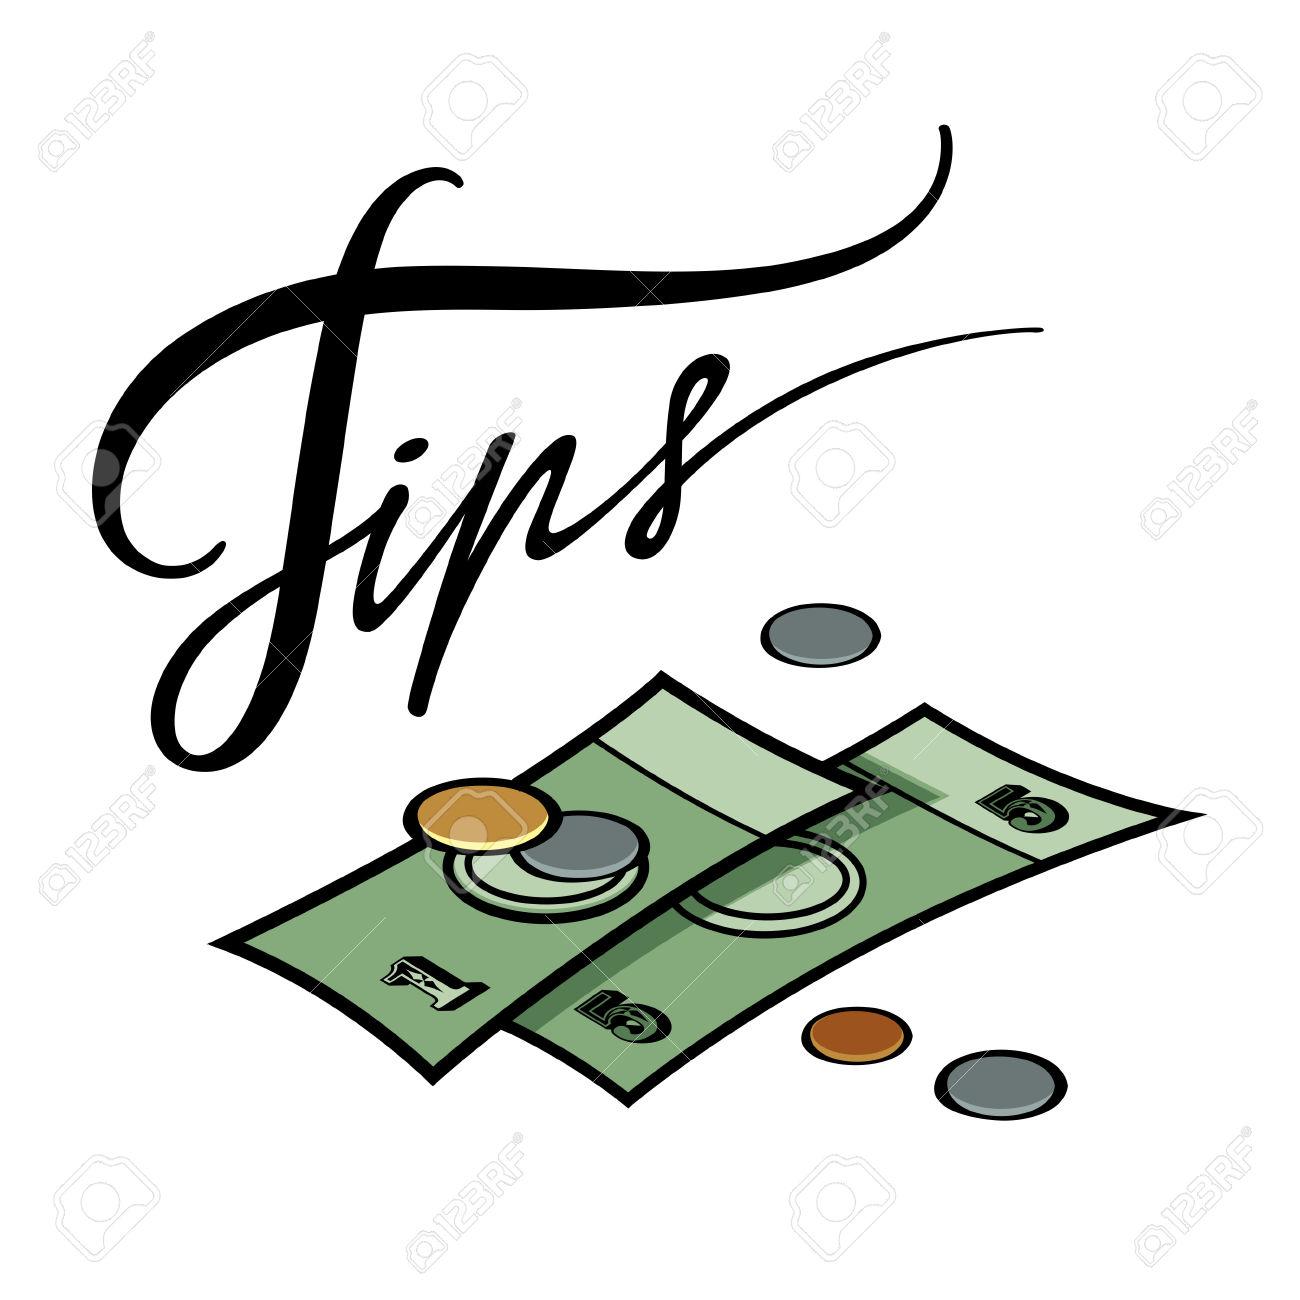 Cash clipart money tip Money Money Tip Download Clipart